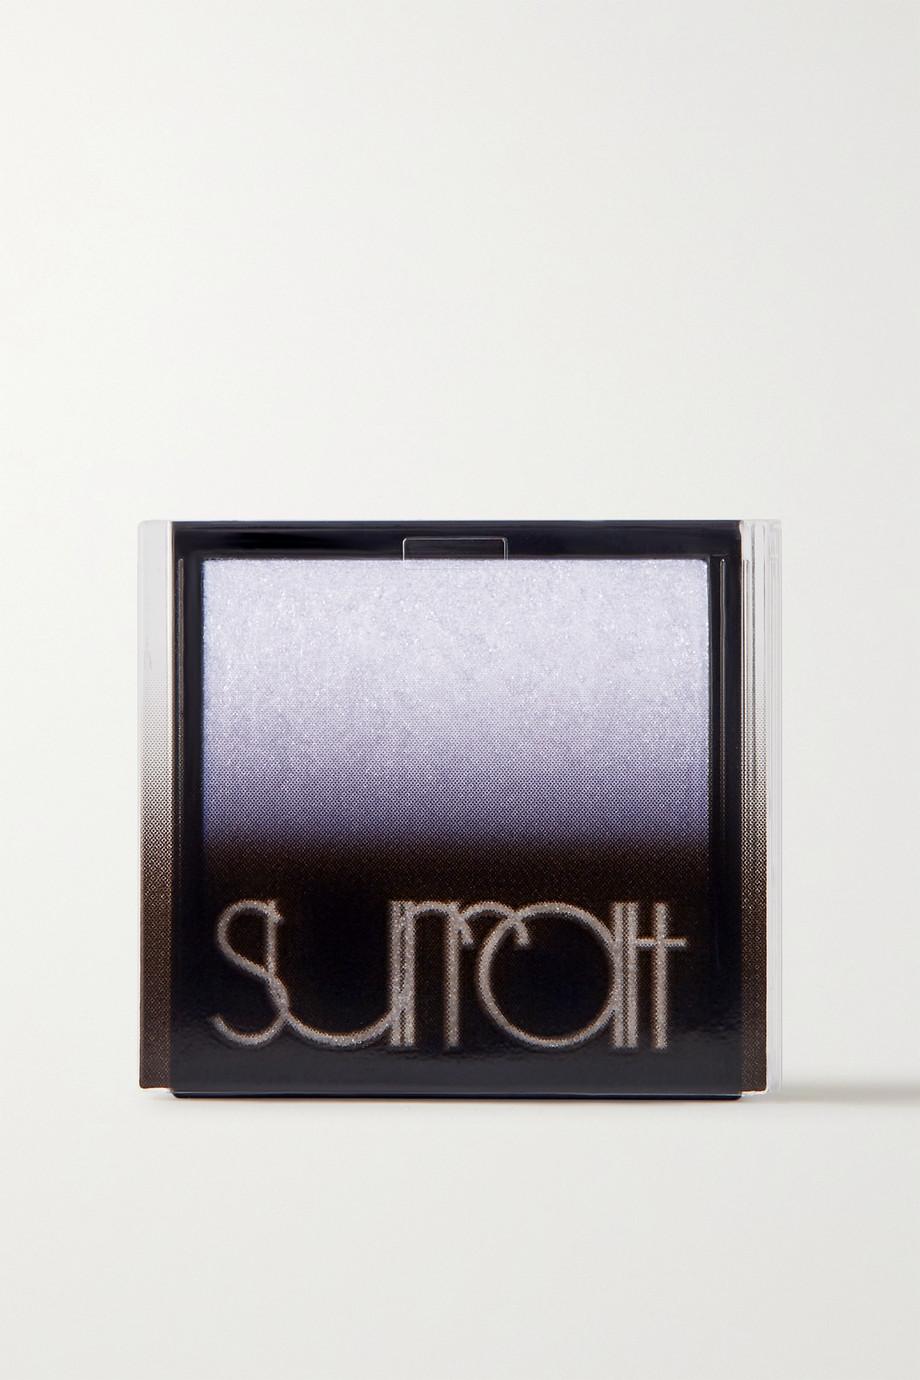 Surratt Beauty Halogram Eyeshadow - Ultraviolet